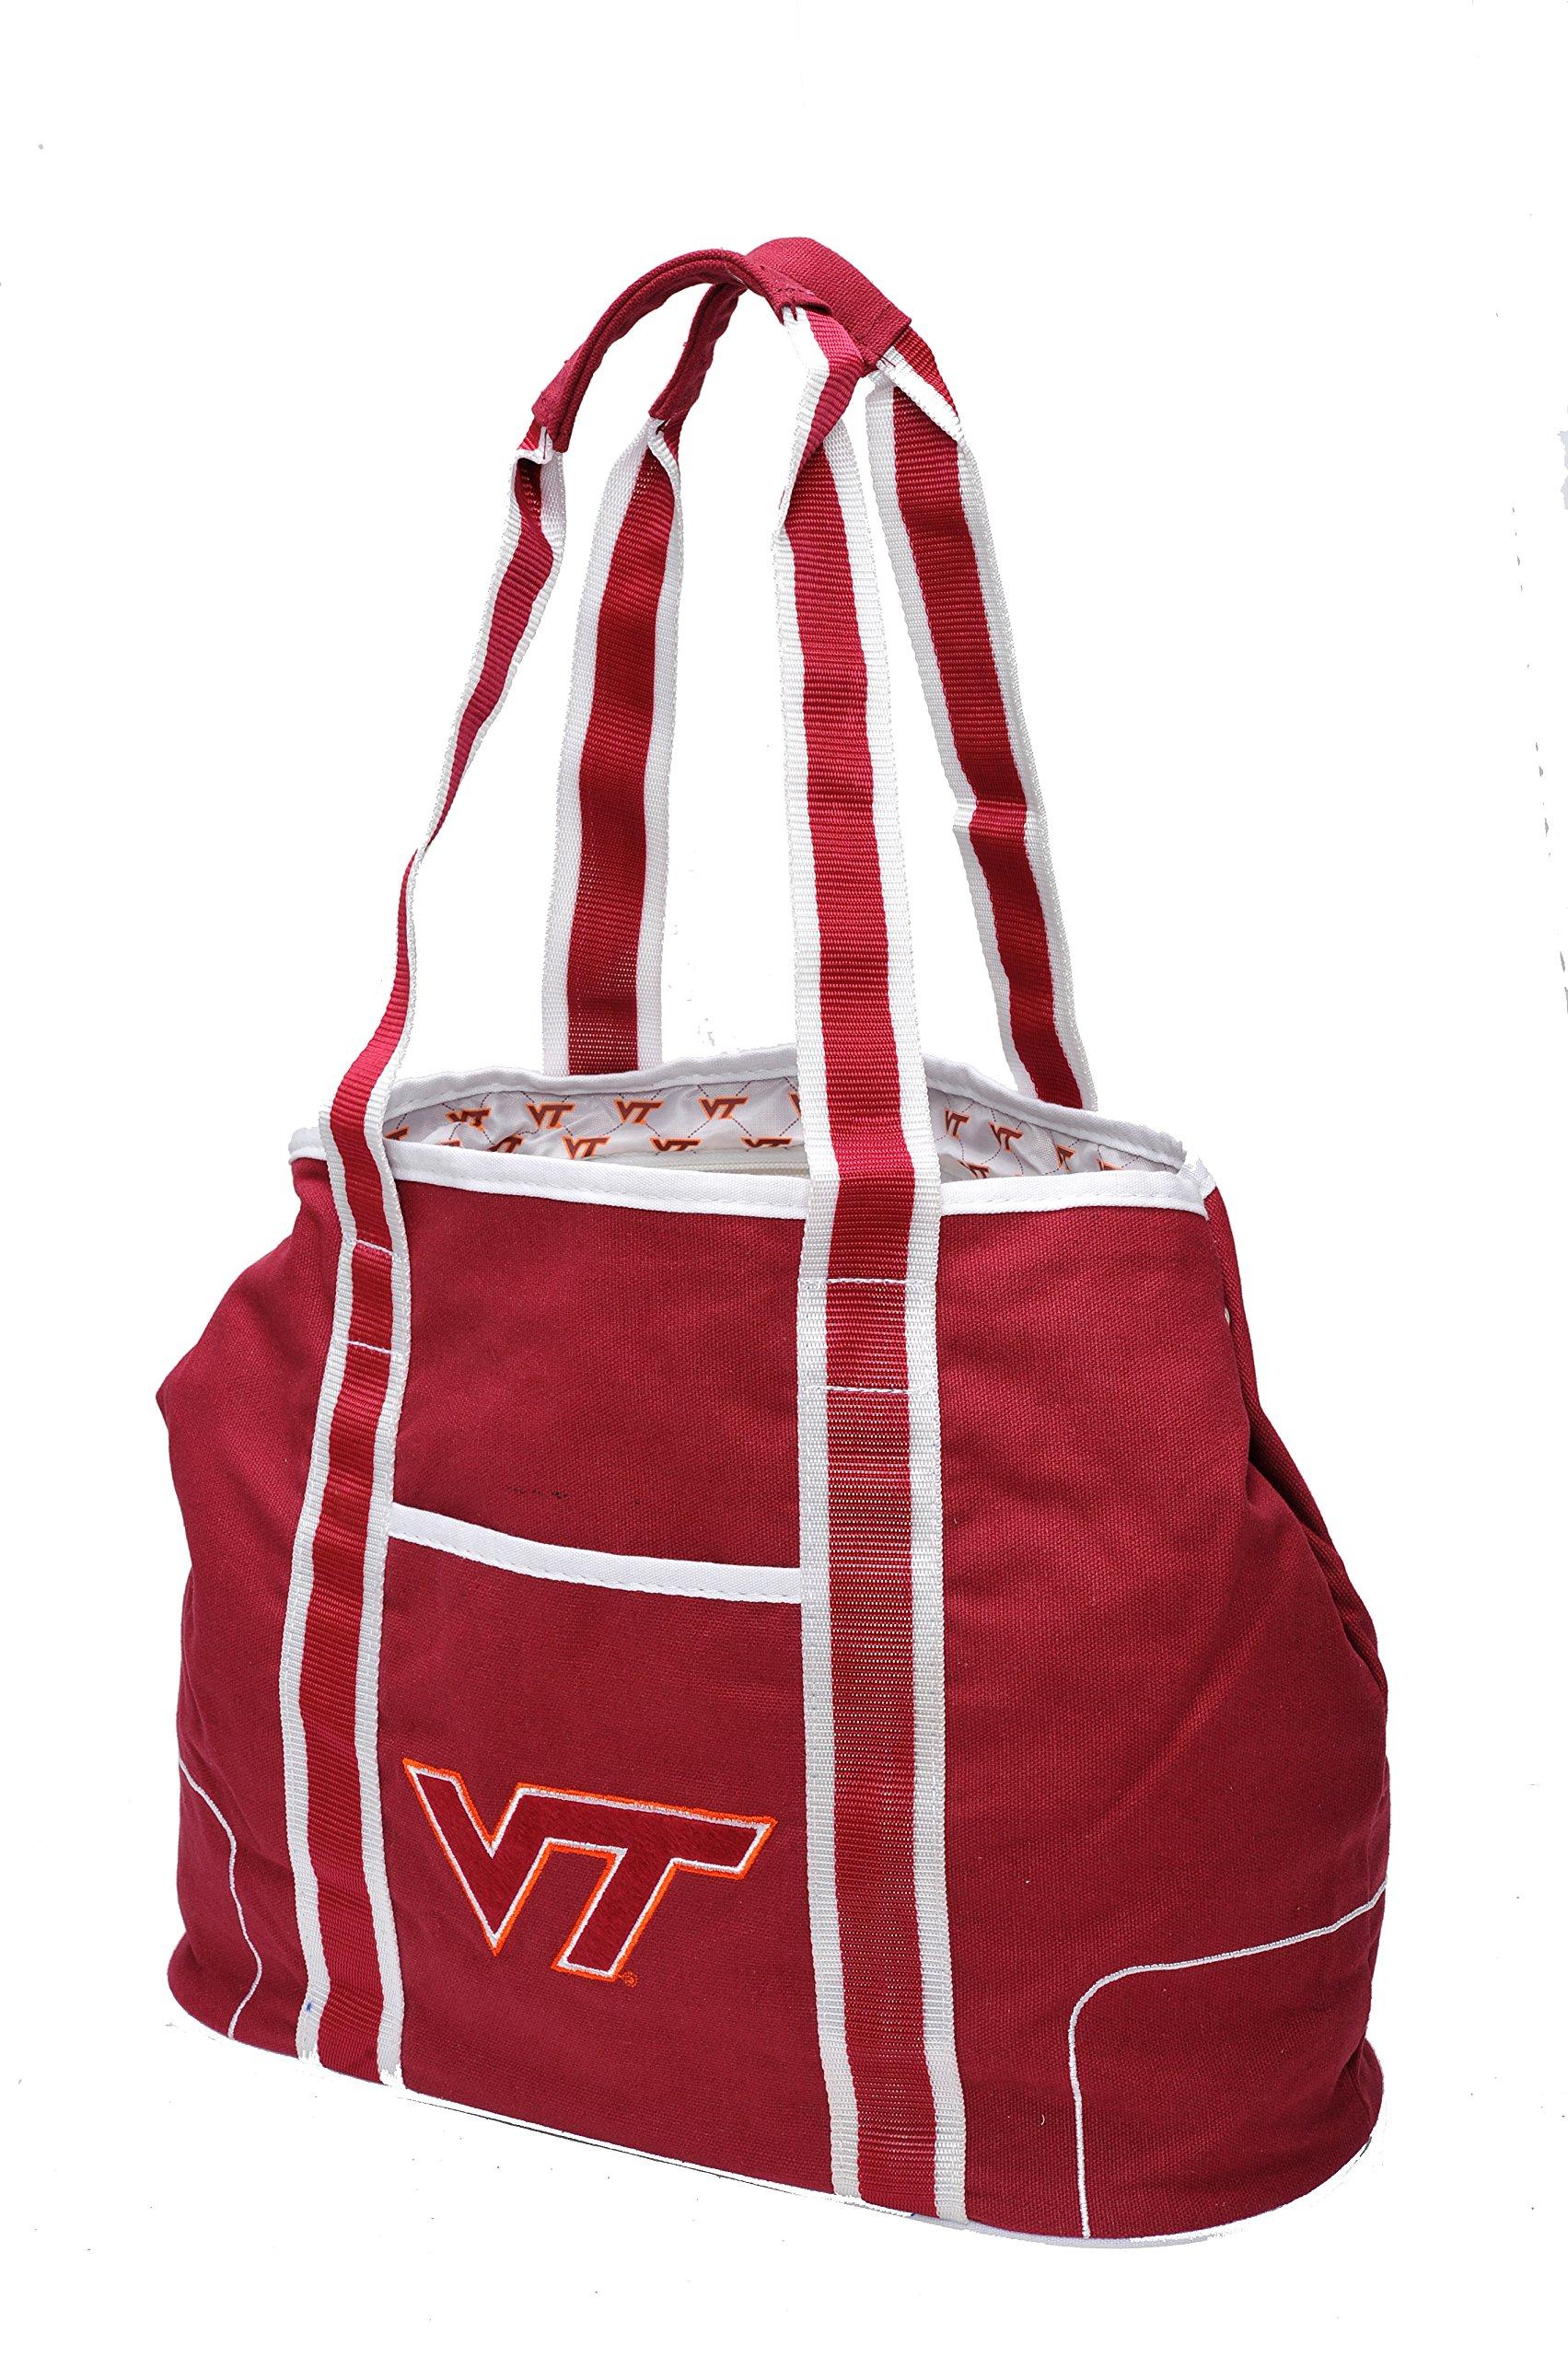 Concept One Accessories NCAA Virginia Tech Hokies Hampton Tote, 12-inch, Maroon